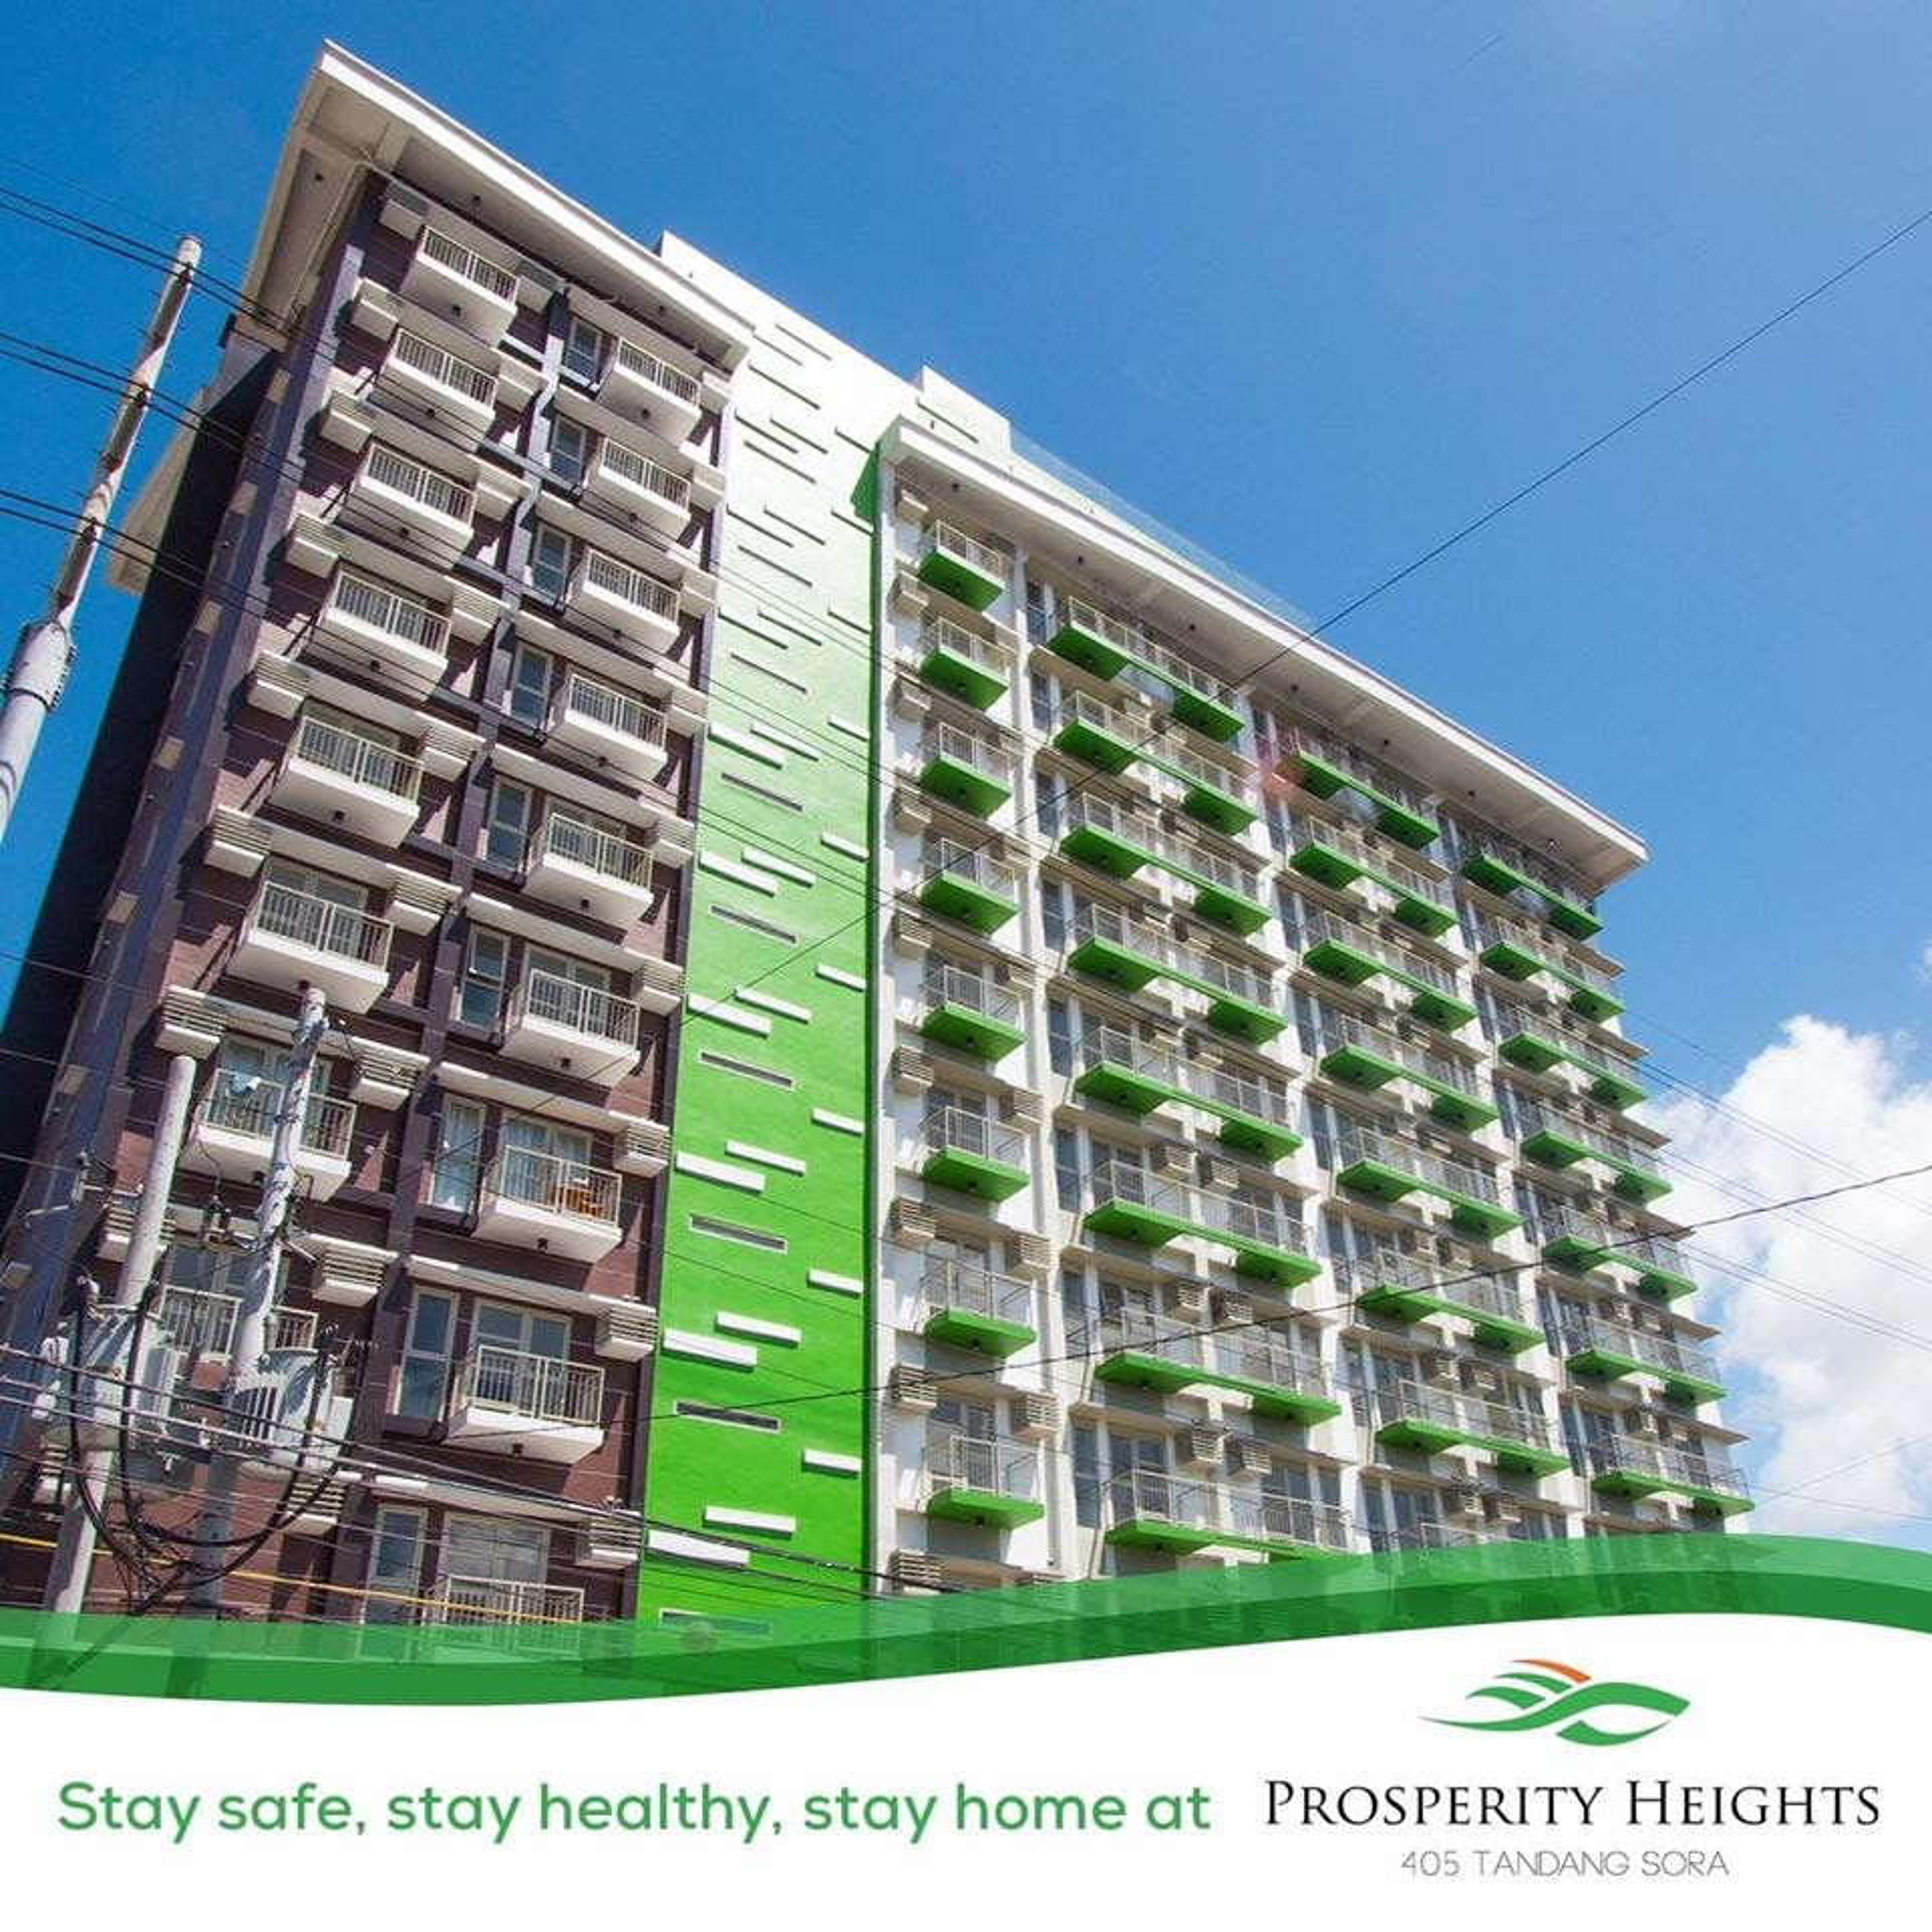 Prosperity Heights